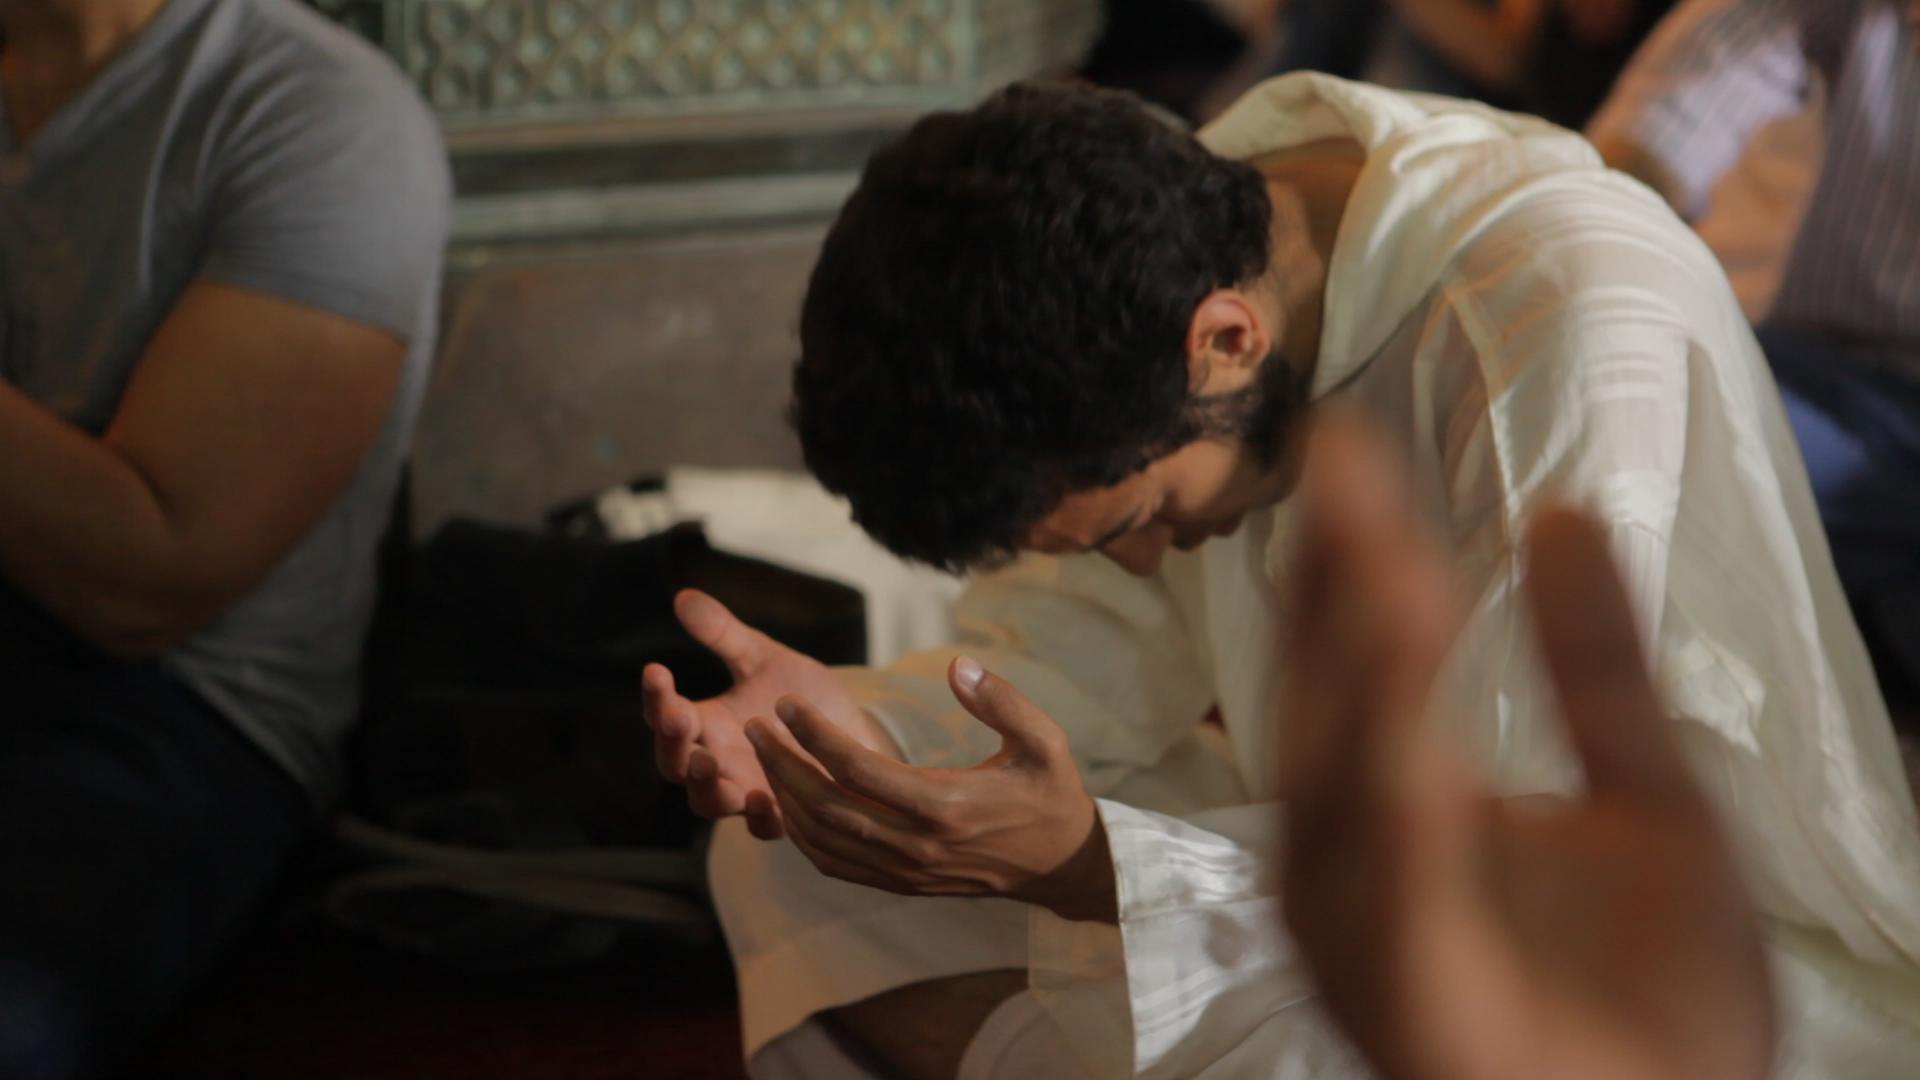 Siwa_Danyal_Mosque_Praying_Day.png